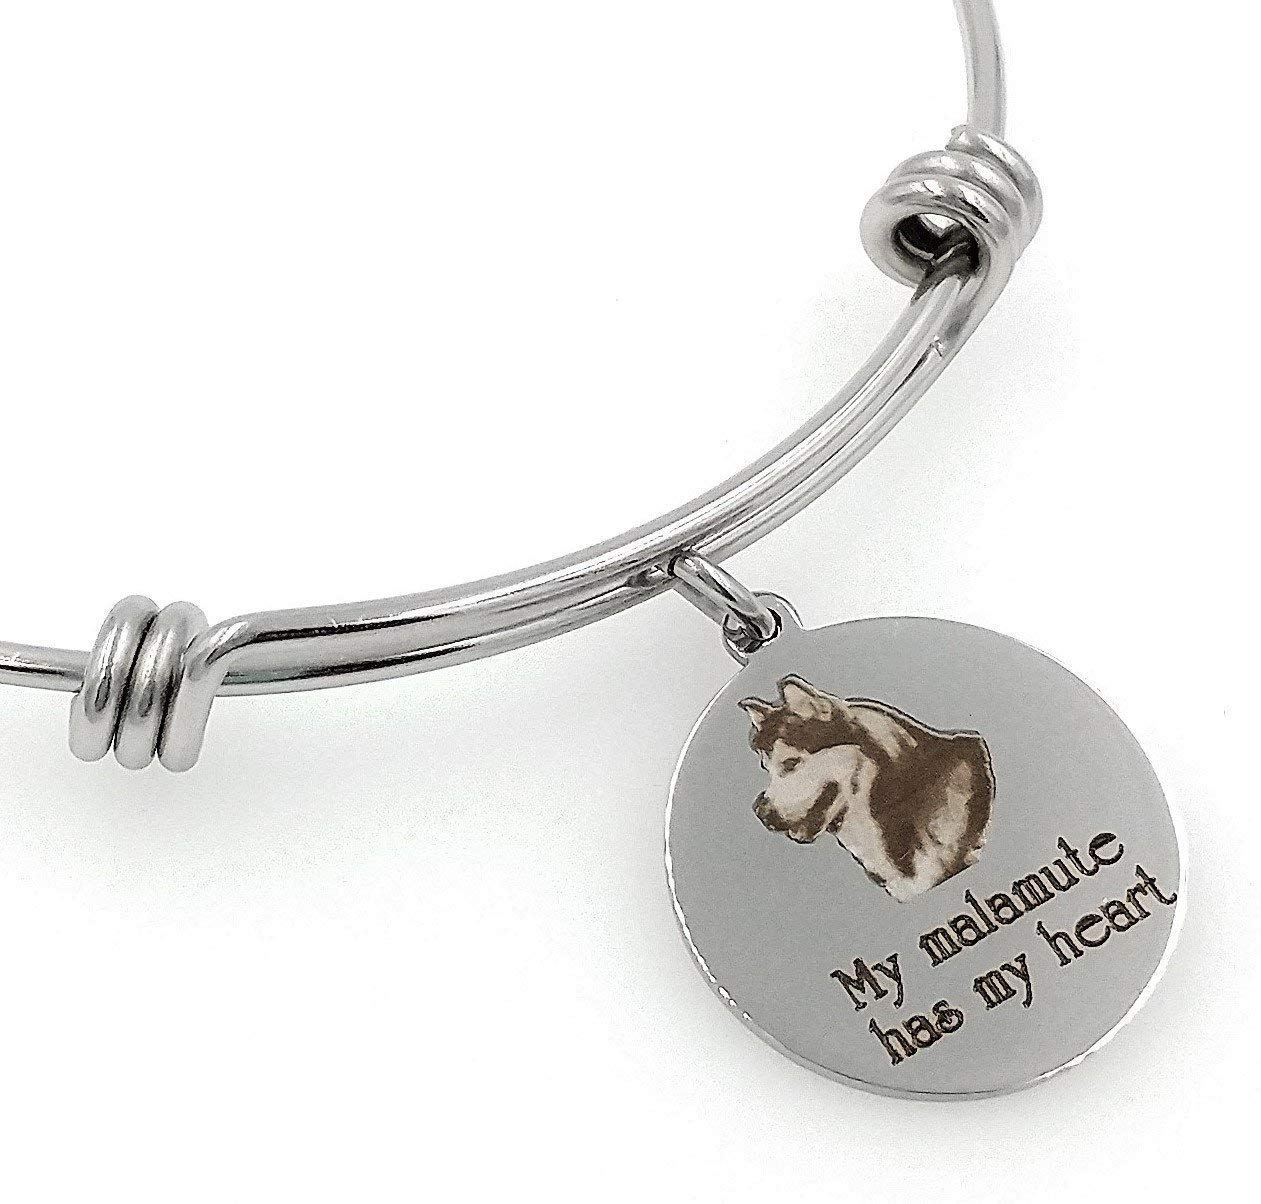 My Malamute, Alaskan Malamute Has My Heart Engraved Expandable Bangle Bracelet